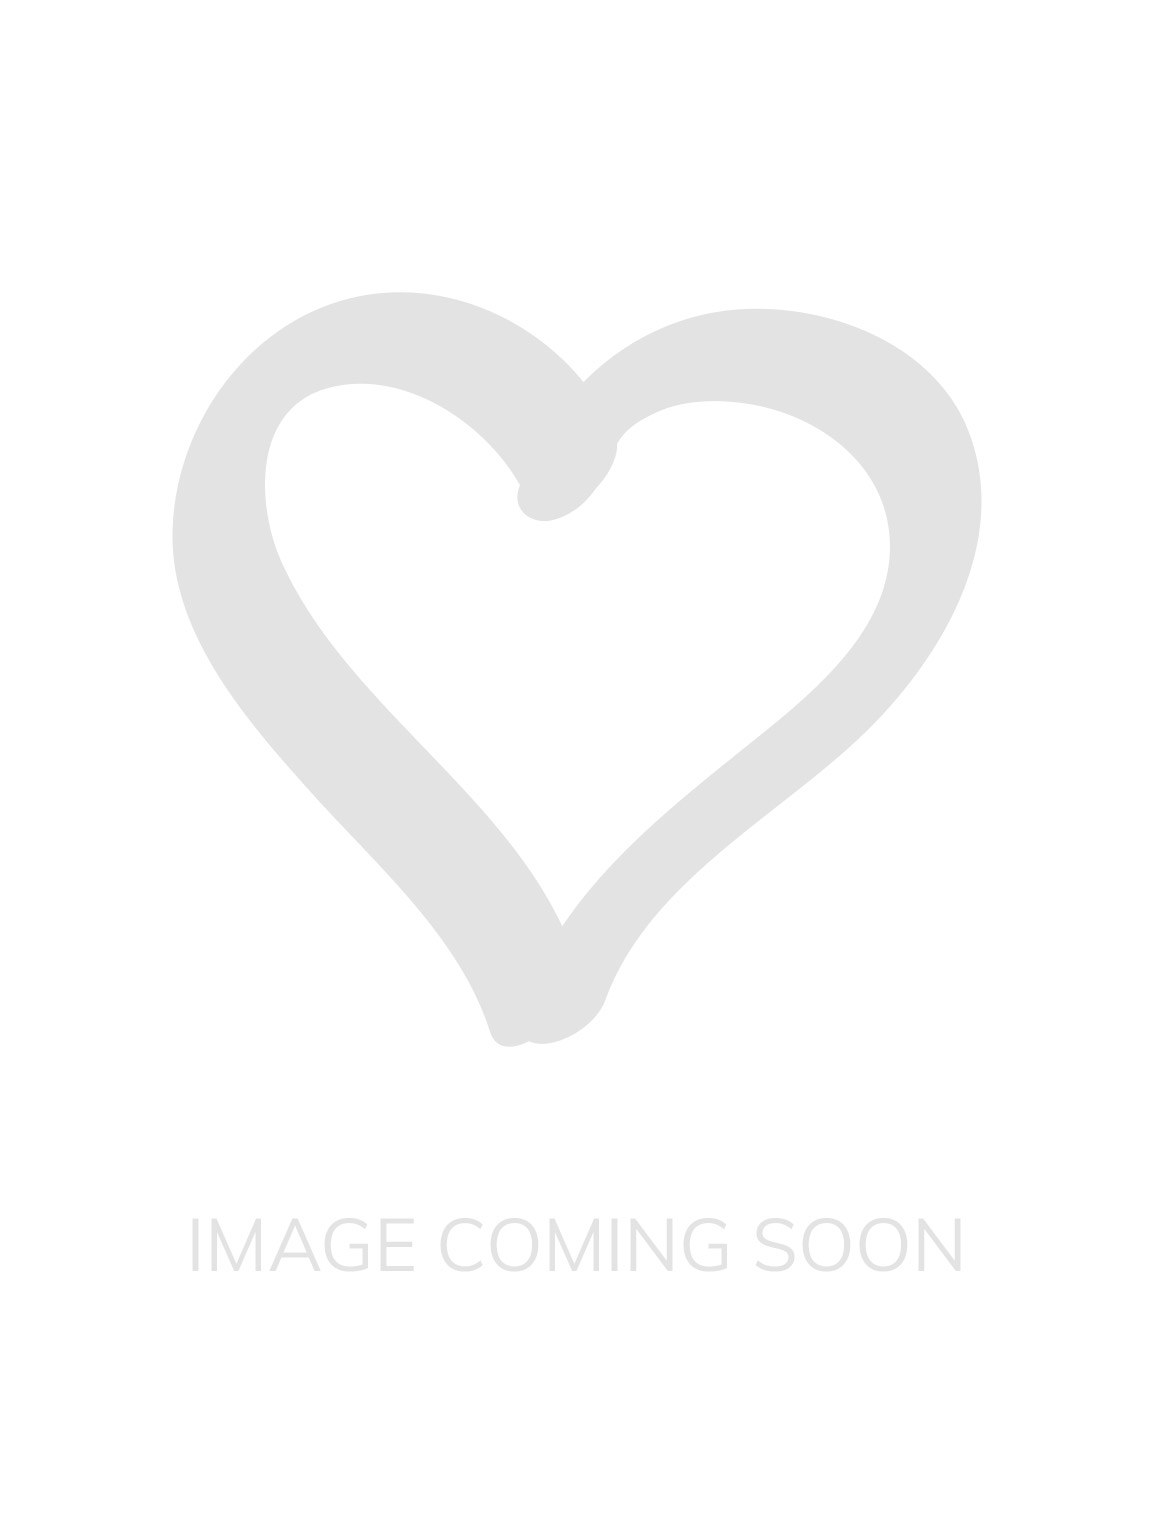 Refine Glamour Brazilian Brief - Seabottom Blue f6091c654